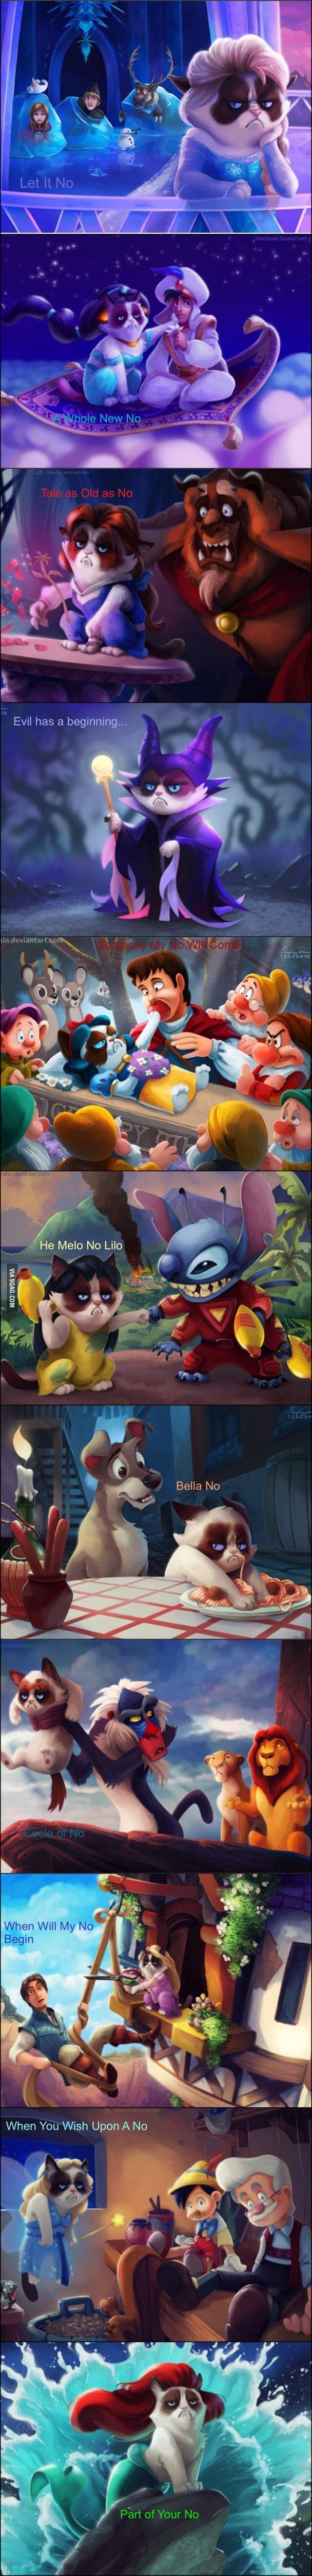 Grumpy Cat and Disney